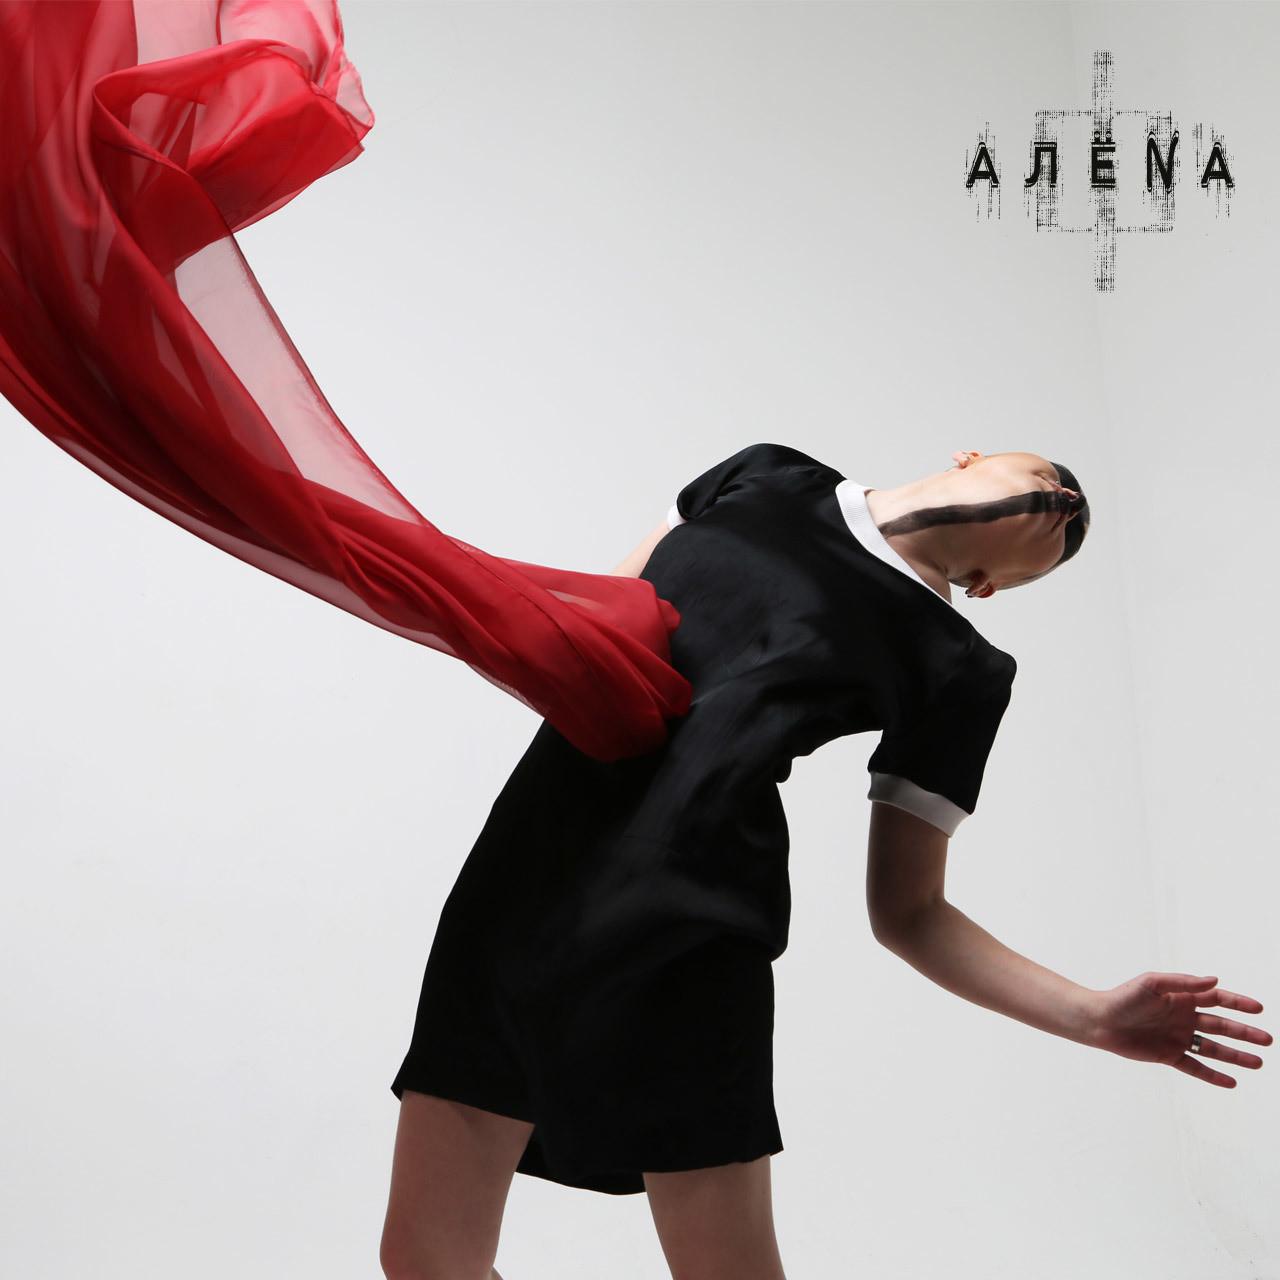 "АЛЁNА ""Лежу в больнице я"" single 2016 (mp3 - 320)"